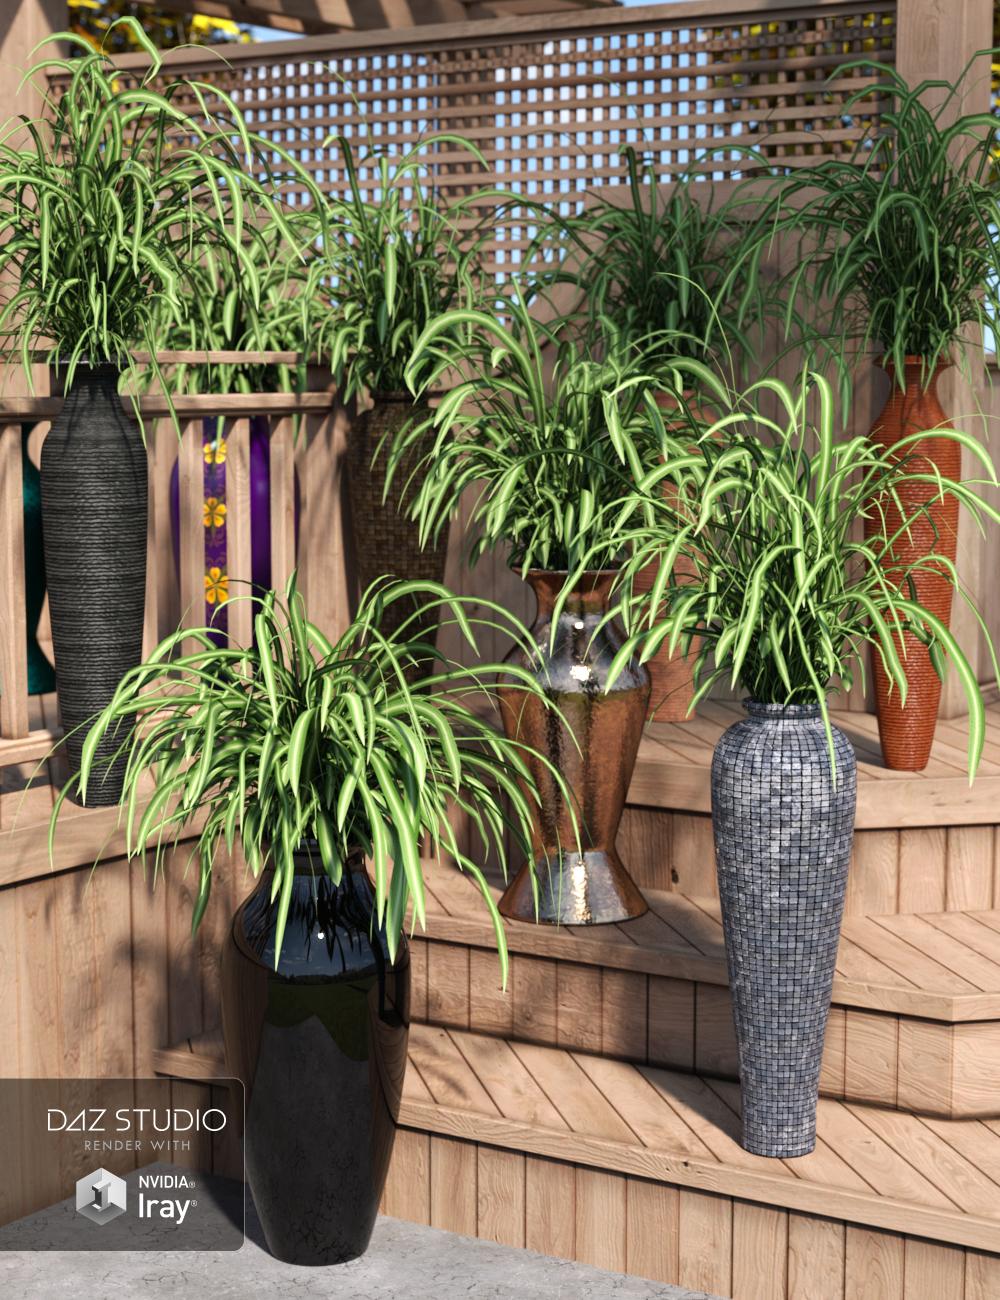 Decor Basics - Floor Vases by: ARTCollab, 3D Models by Daz 3D